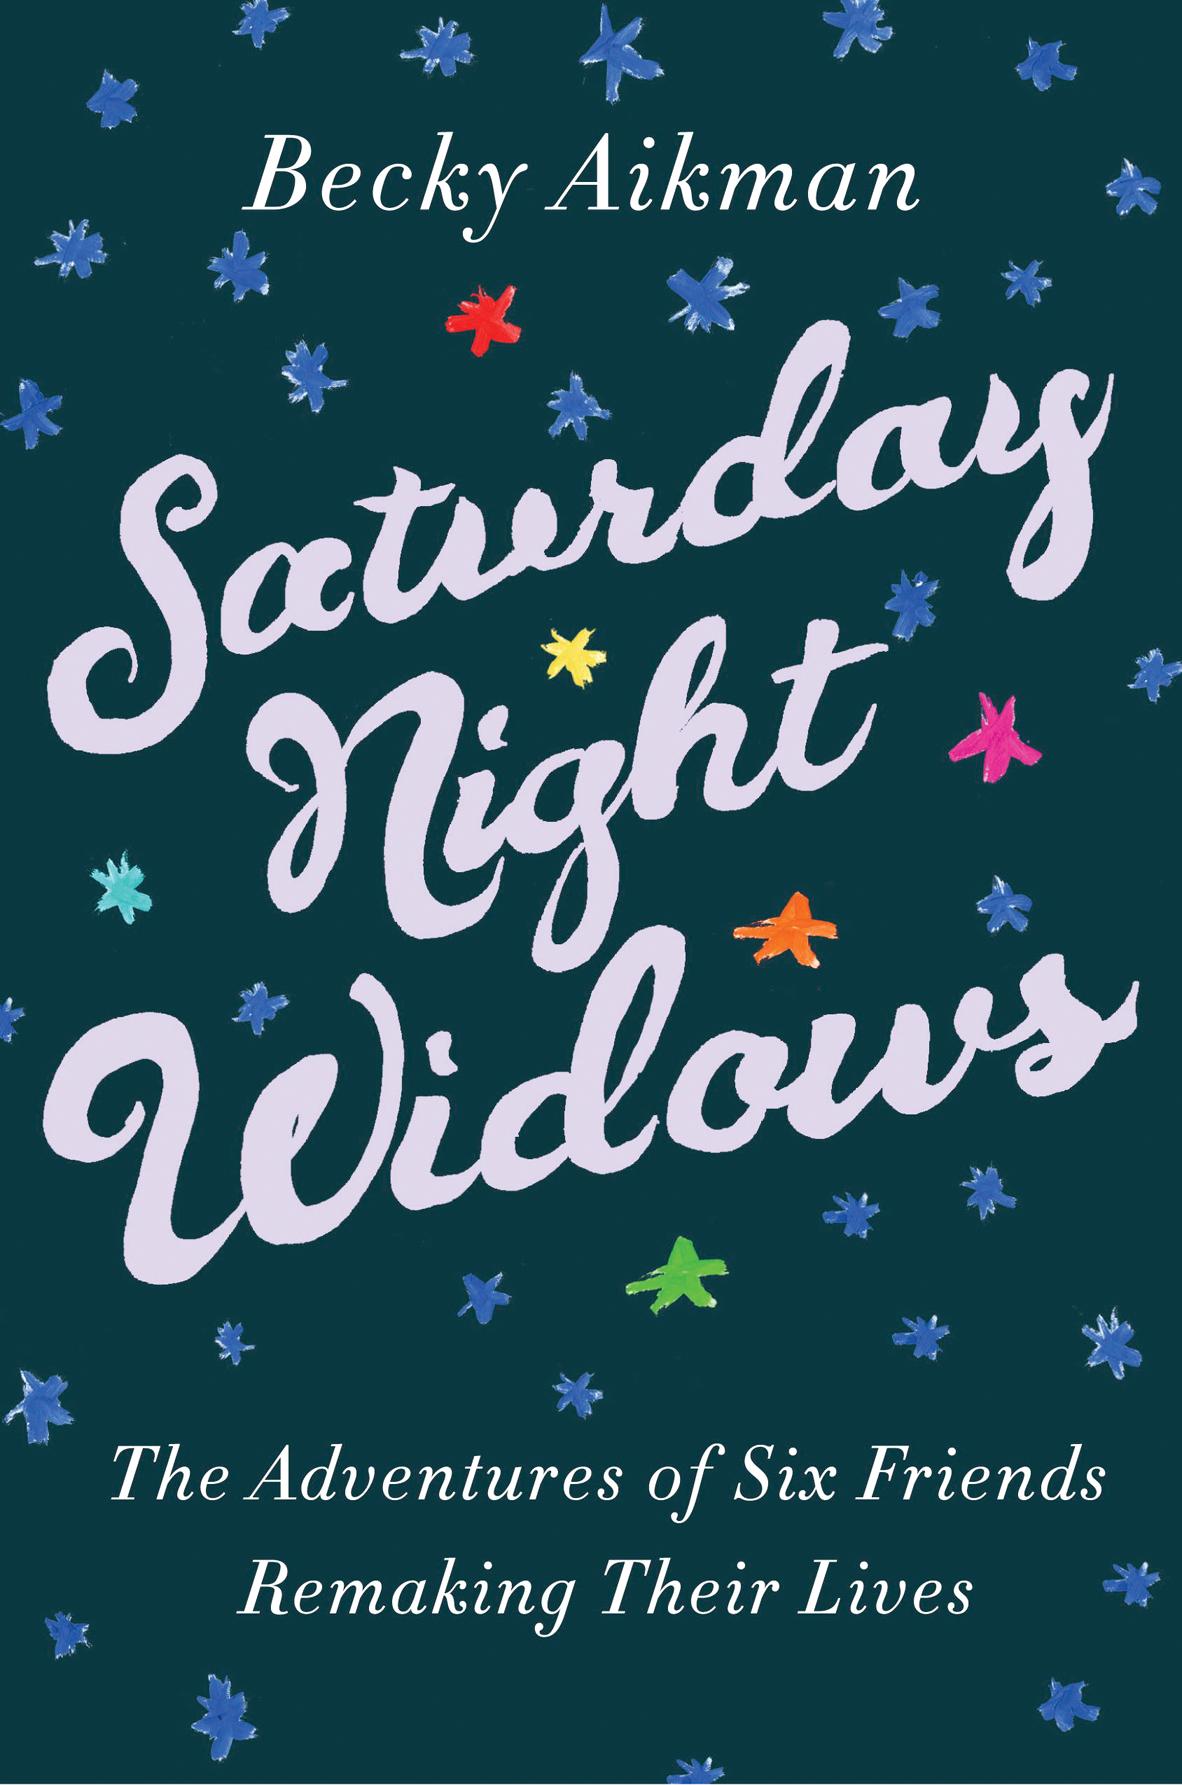 Saturday Night Widows book cover Mar 13 p160